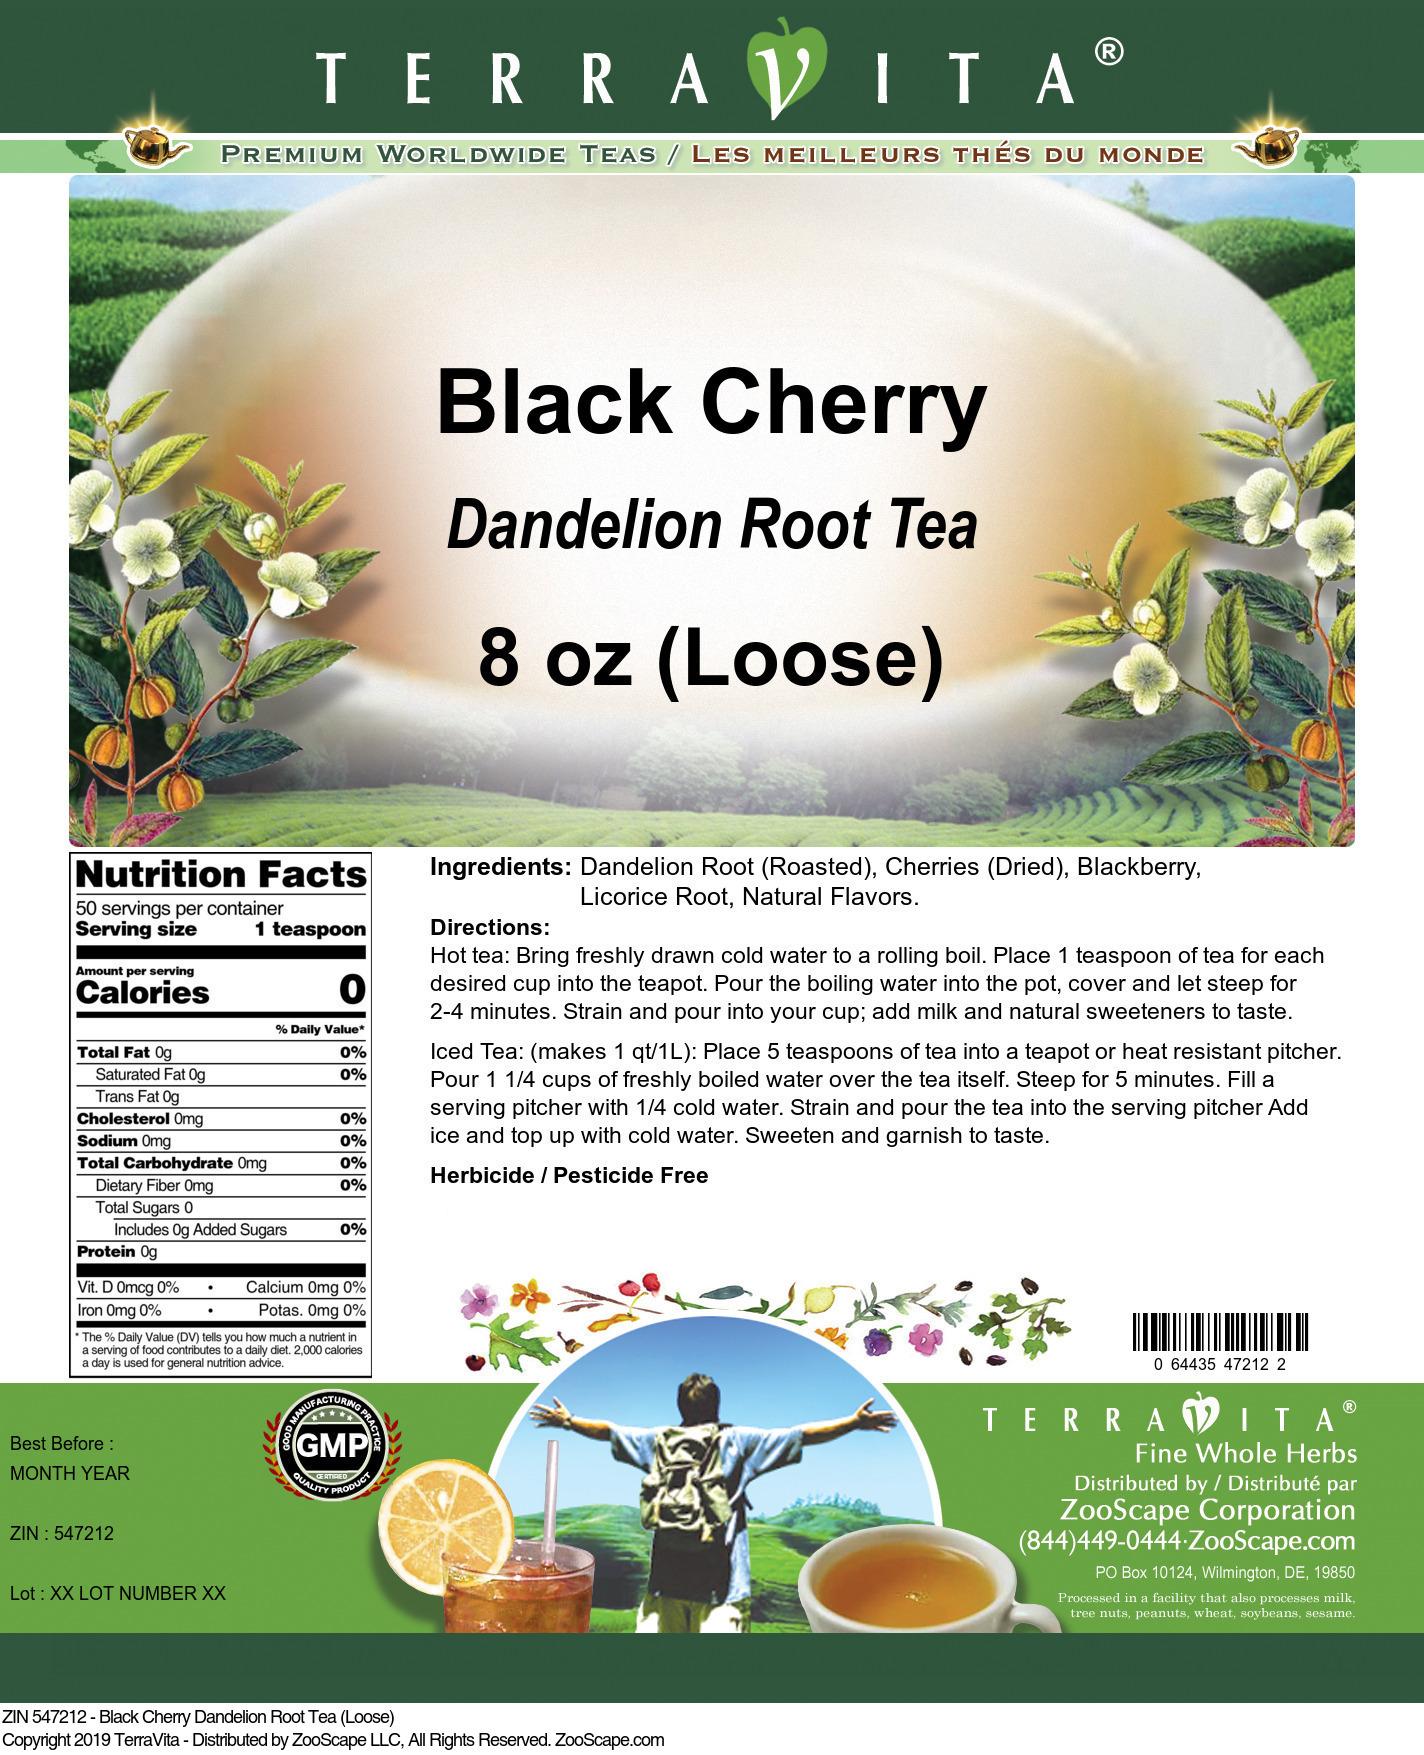 Black Cherry Dandelion Root Tea (Loose)